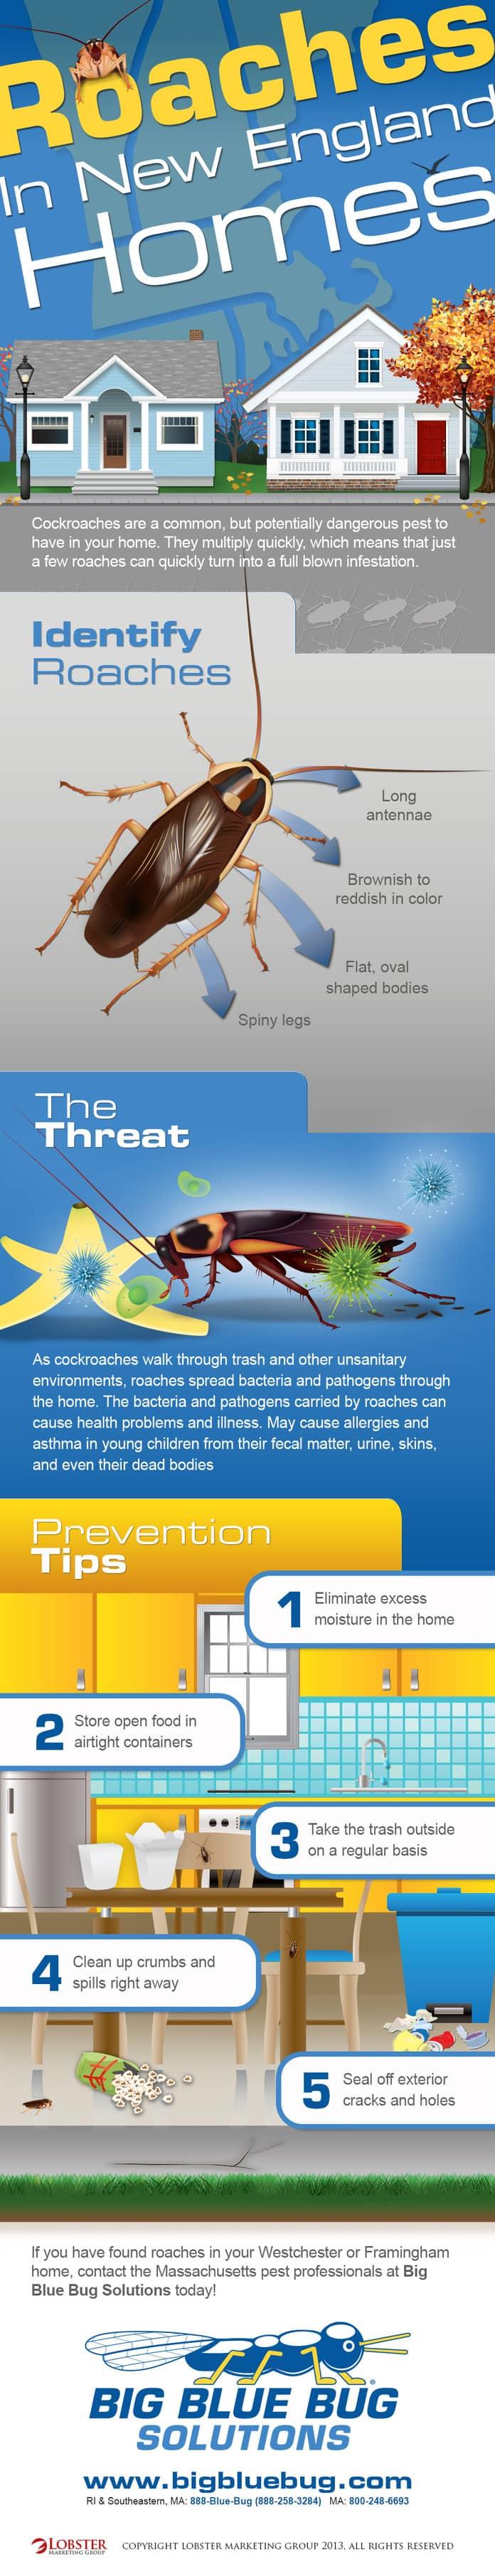 Prevent Cockroaches In Massachusetts